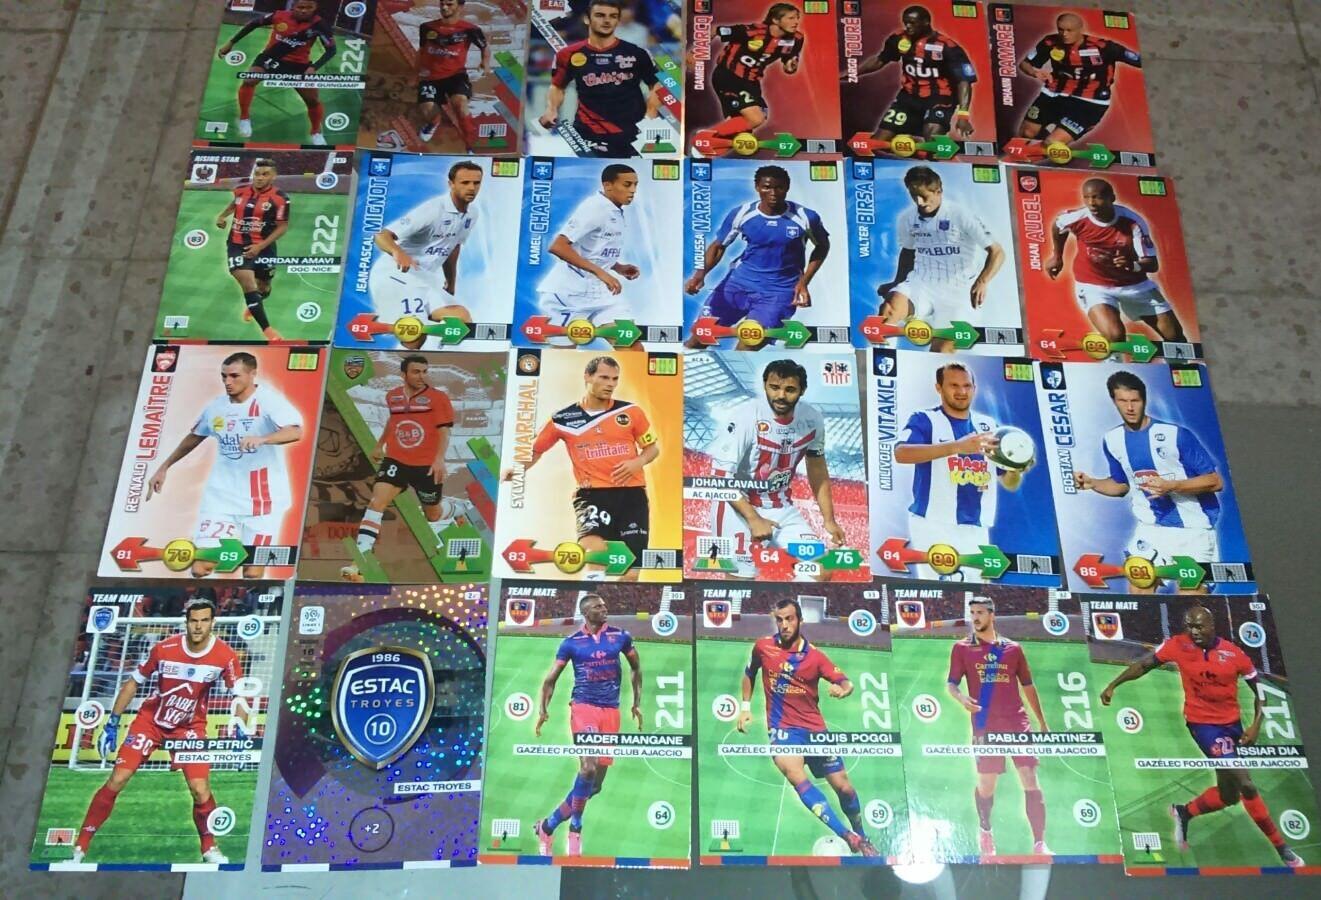 Lot Troyes cartes Adrenalyn ligue 1 Guingamp Nancy Ajaccio Troyes Lot Nice cards football 0ff2af